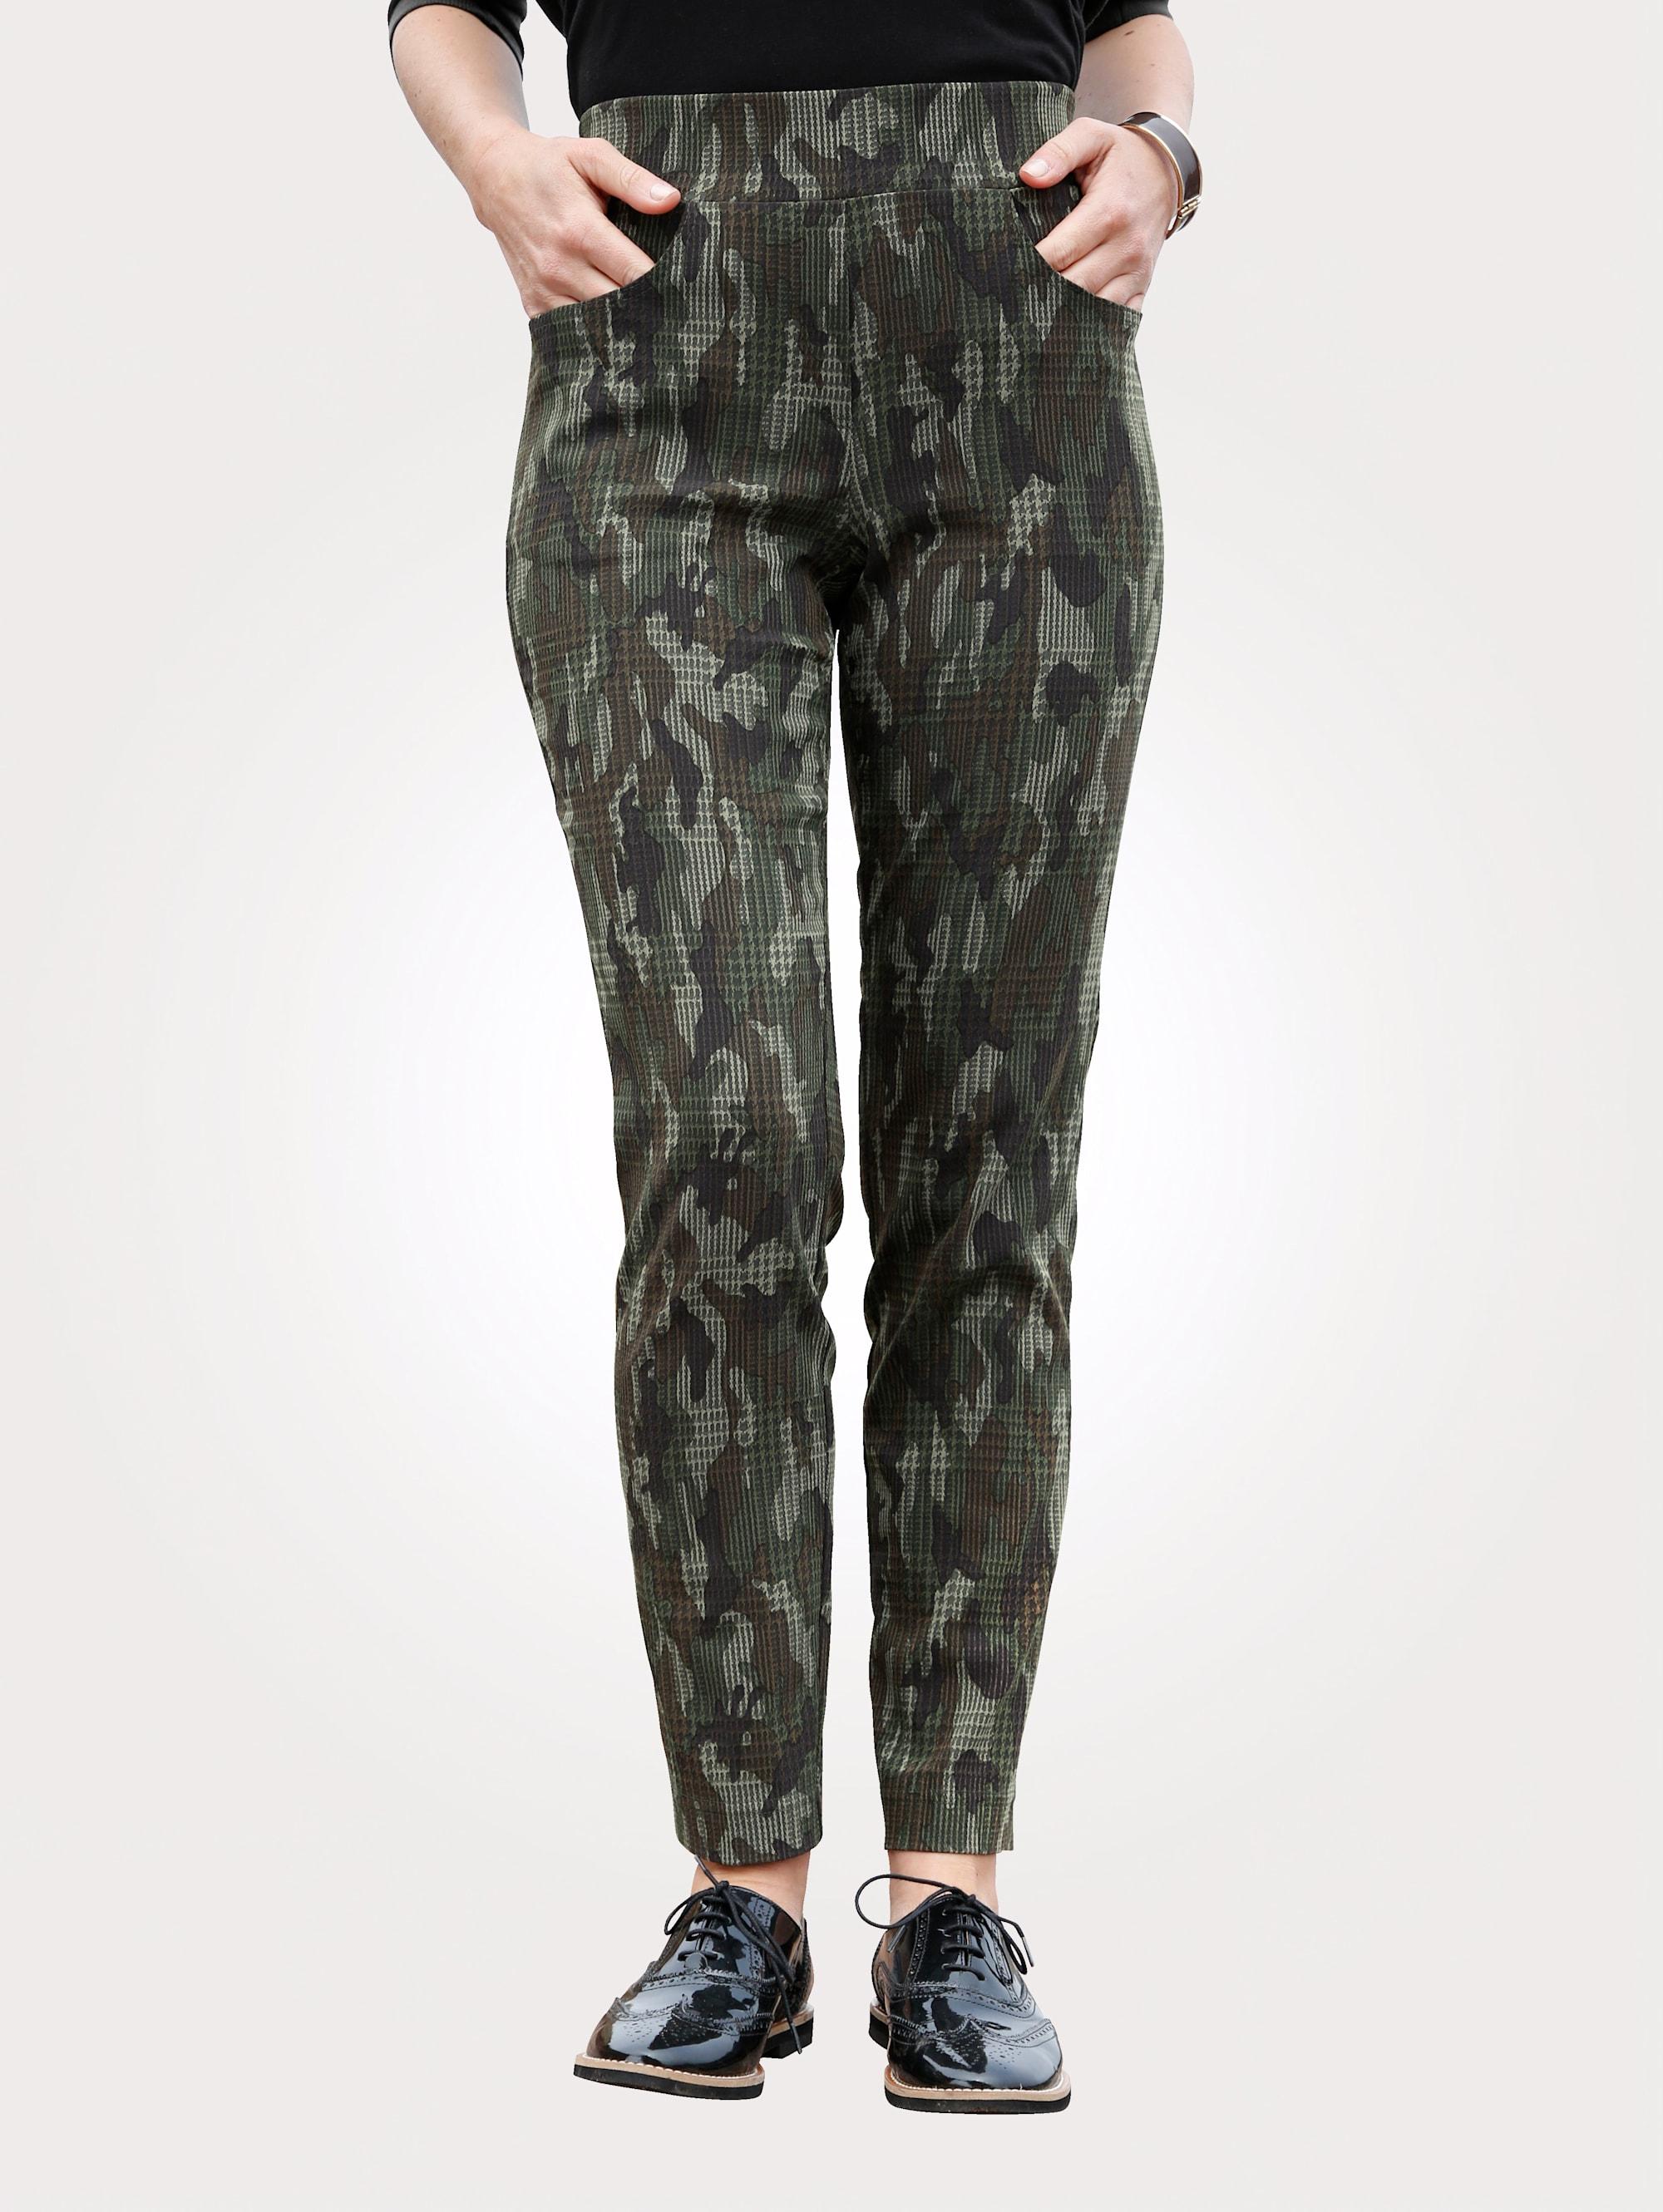 MONA Schlupfhose mit Camouflage-Muster uduoK 48lHU